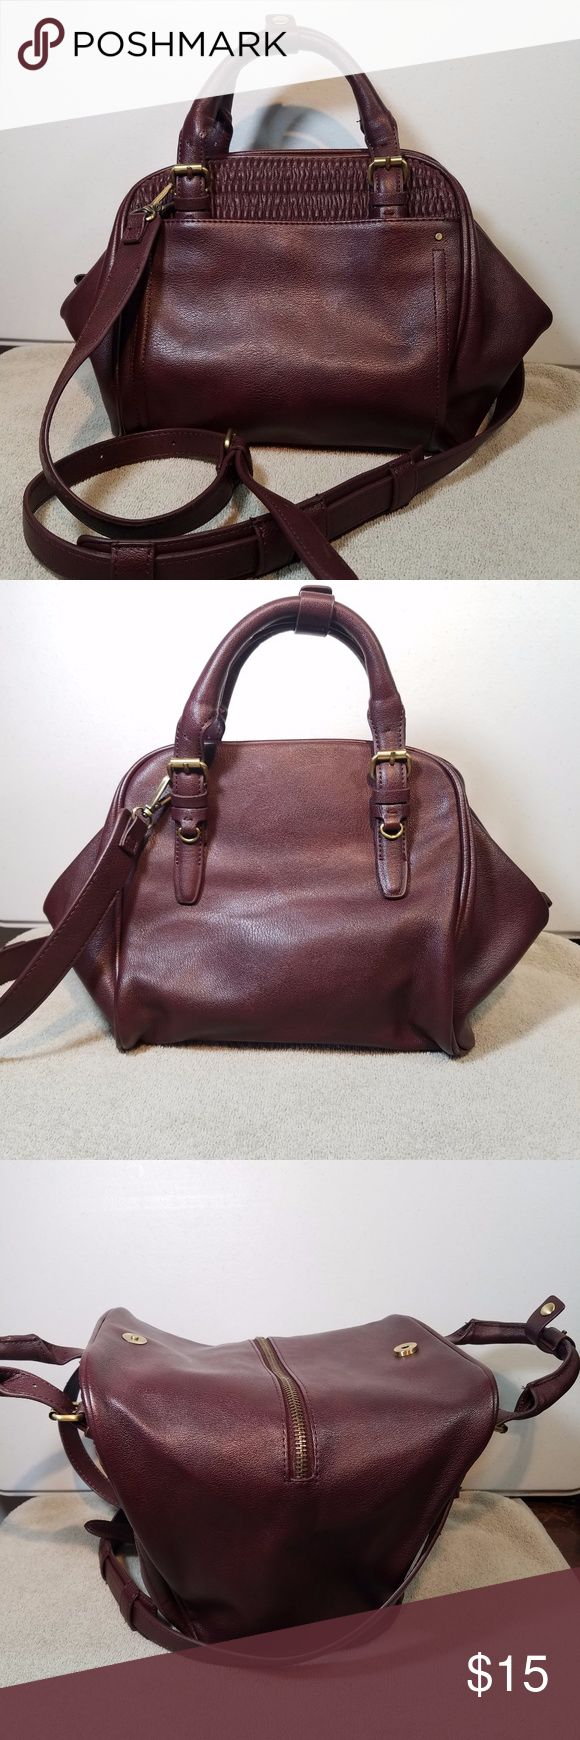 "Zara Burgundy Wine Handbag Crossbody Purse Like New. intersting design. 16 x 9.5"" 3.5"" handle drop, 23"" strap drop. Faux leather. Zara Bags Crossbody Bags"